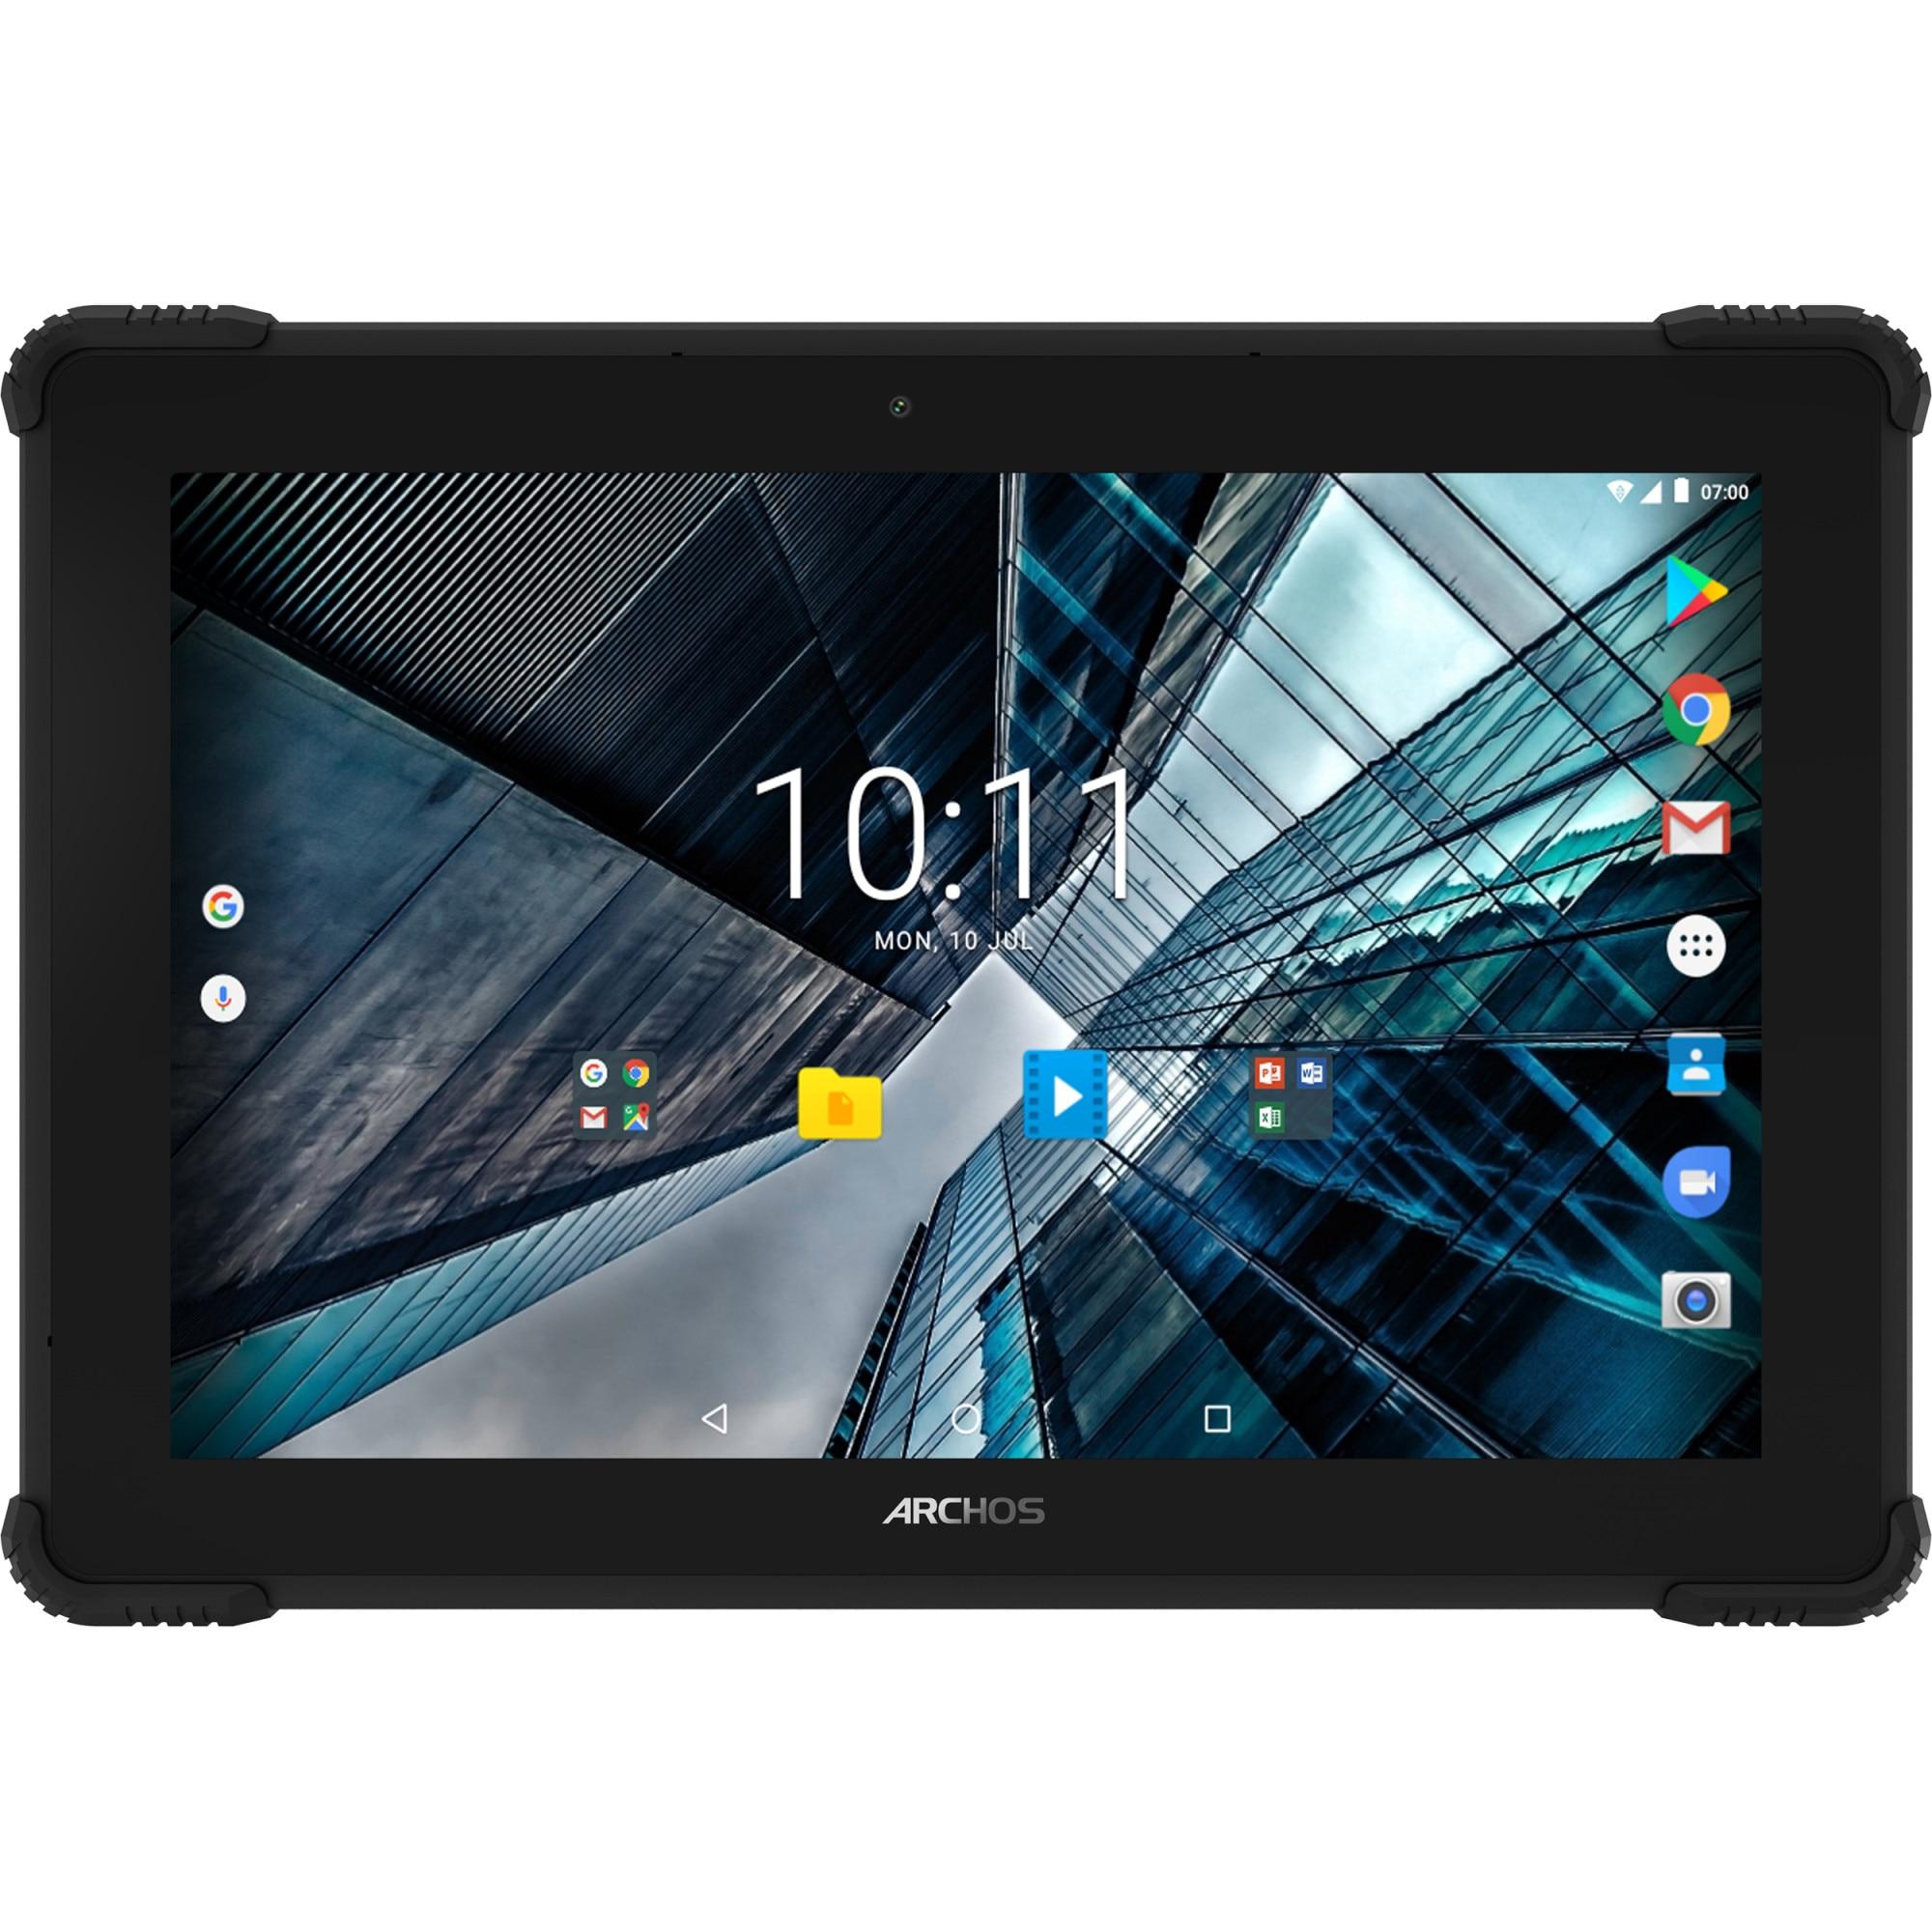 "Fotografie Tableta Archos Sense 101X, Quad-Core 1.3 GHz, 10.1"", 2GB RAM, 32GB, 4G, Black"